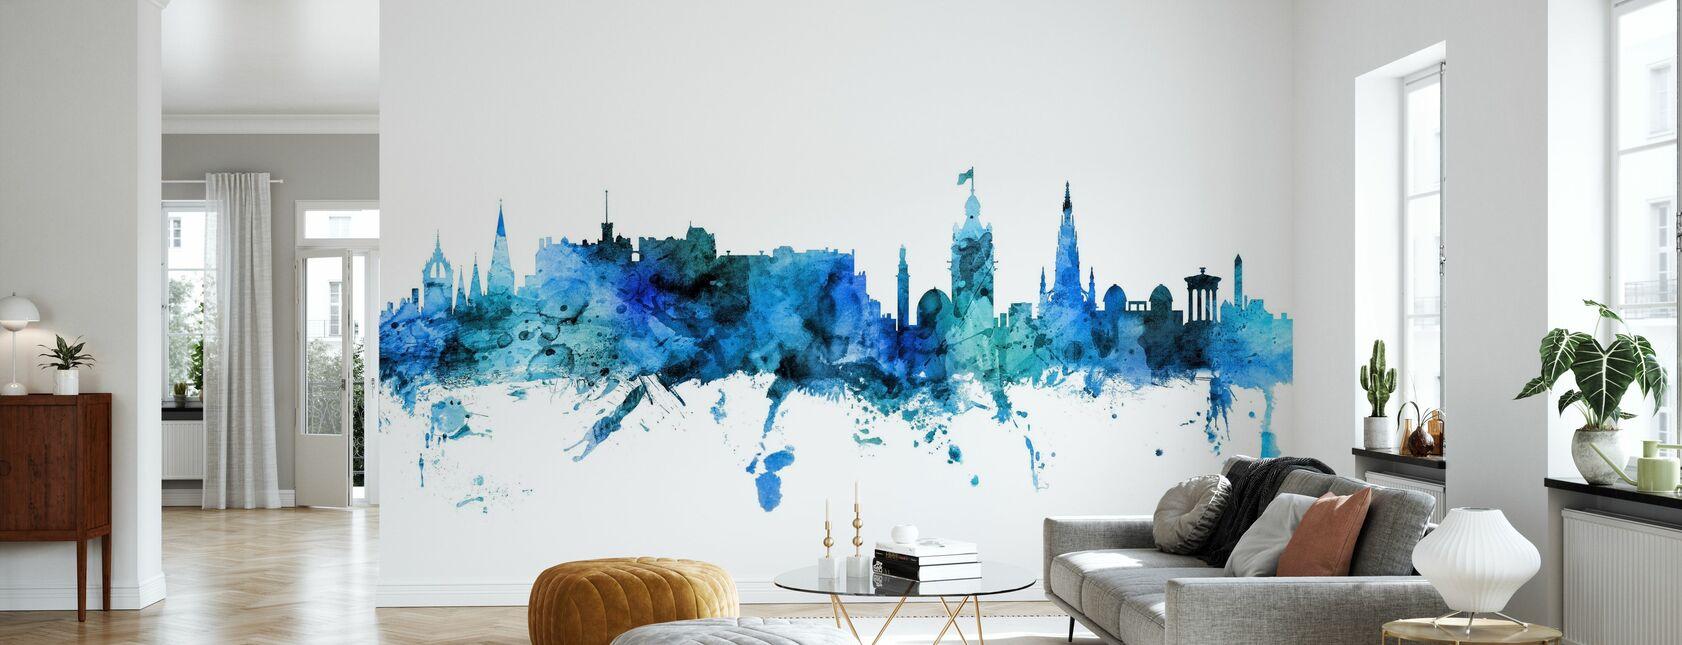 Edinburgh Scotland Skyline - Wallpaper - Living Room